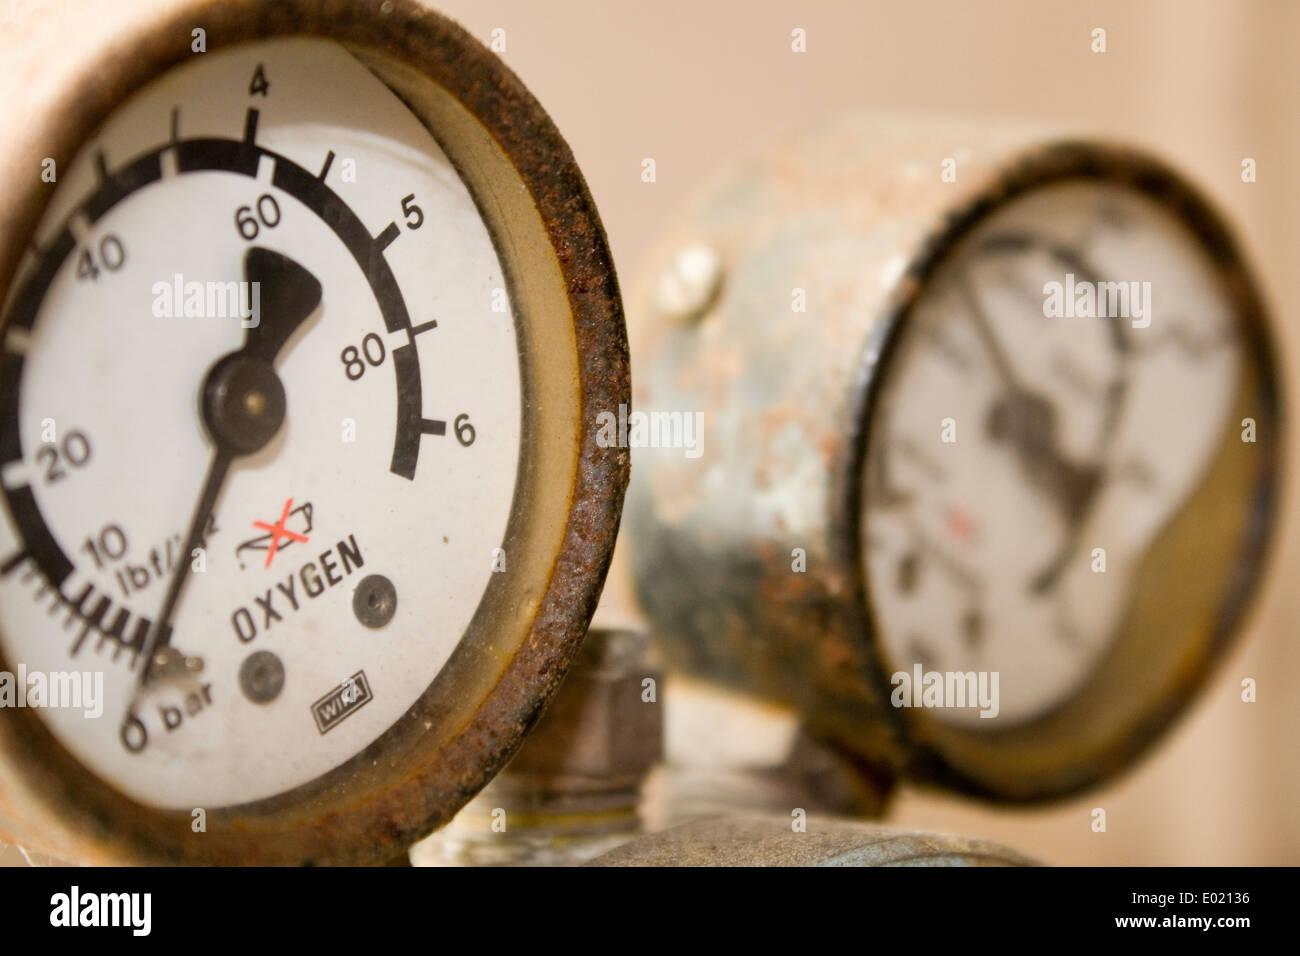 old oxygen gages on a regulator - Stock Image